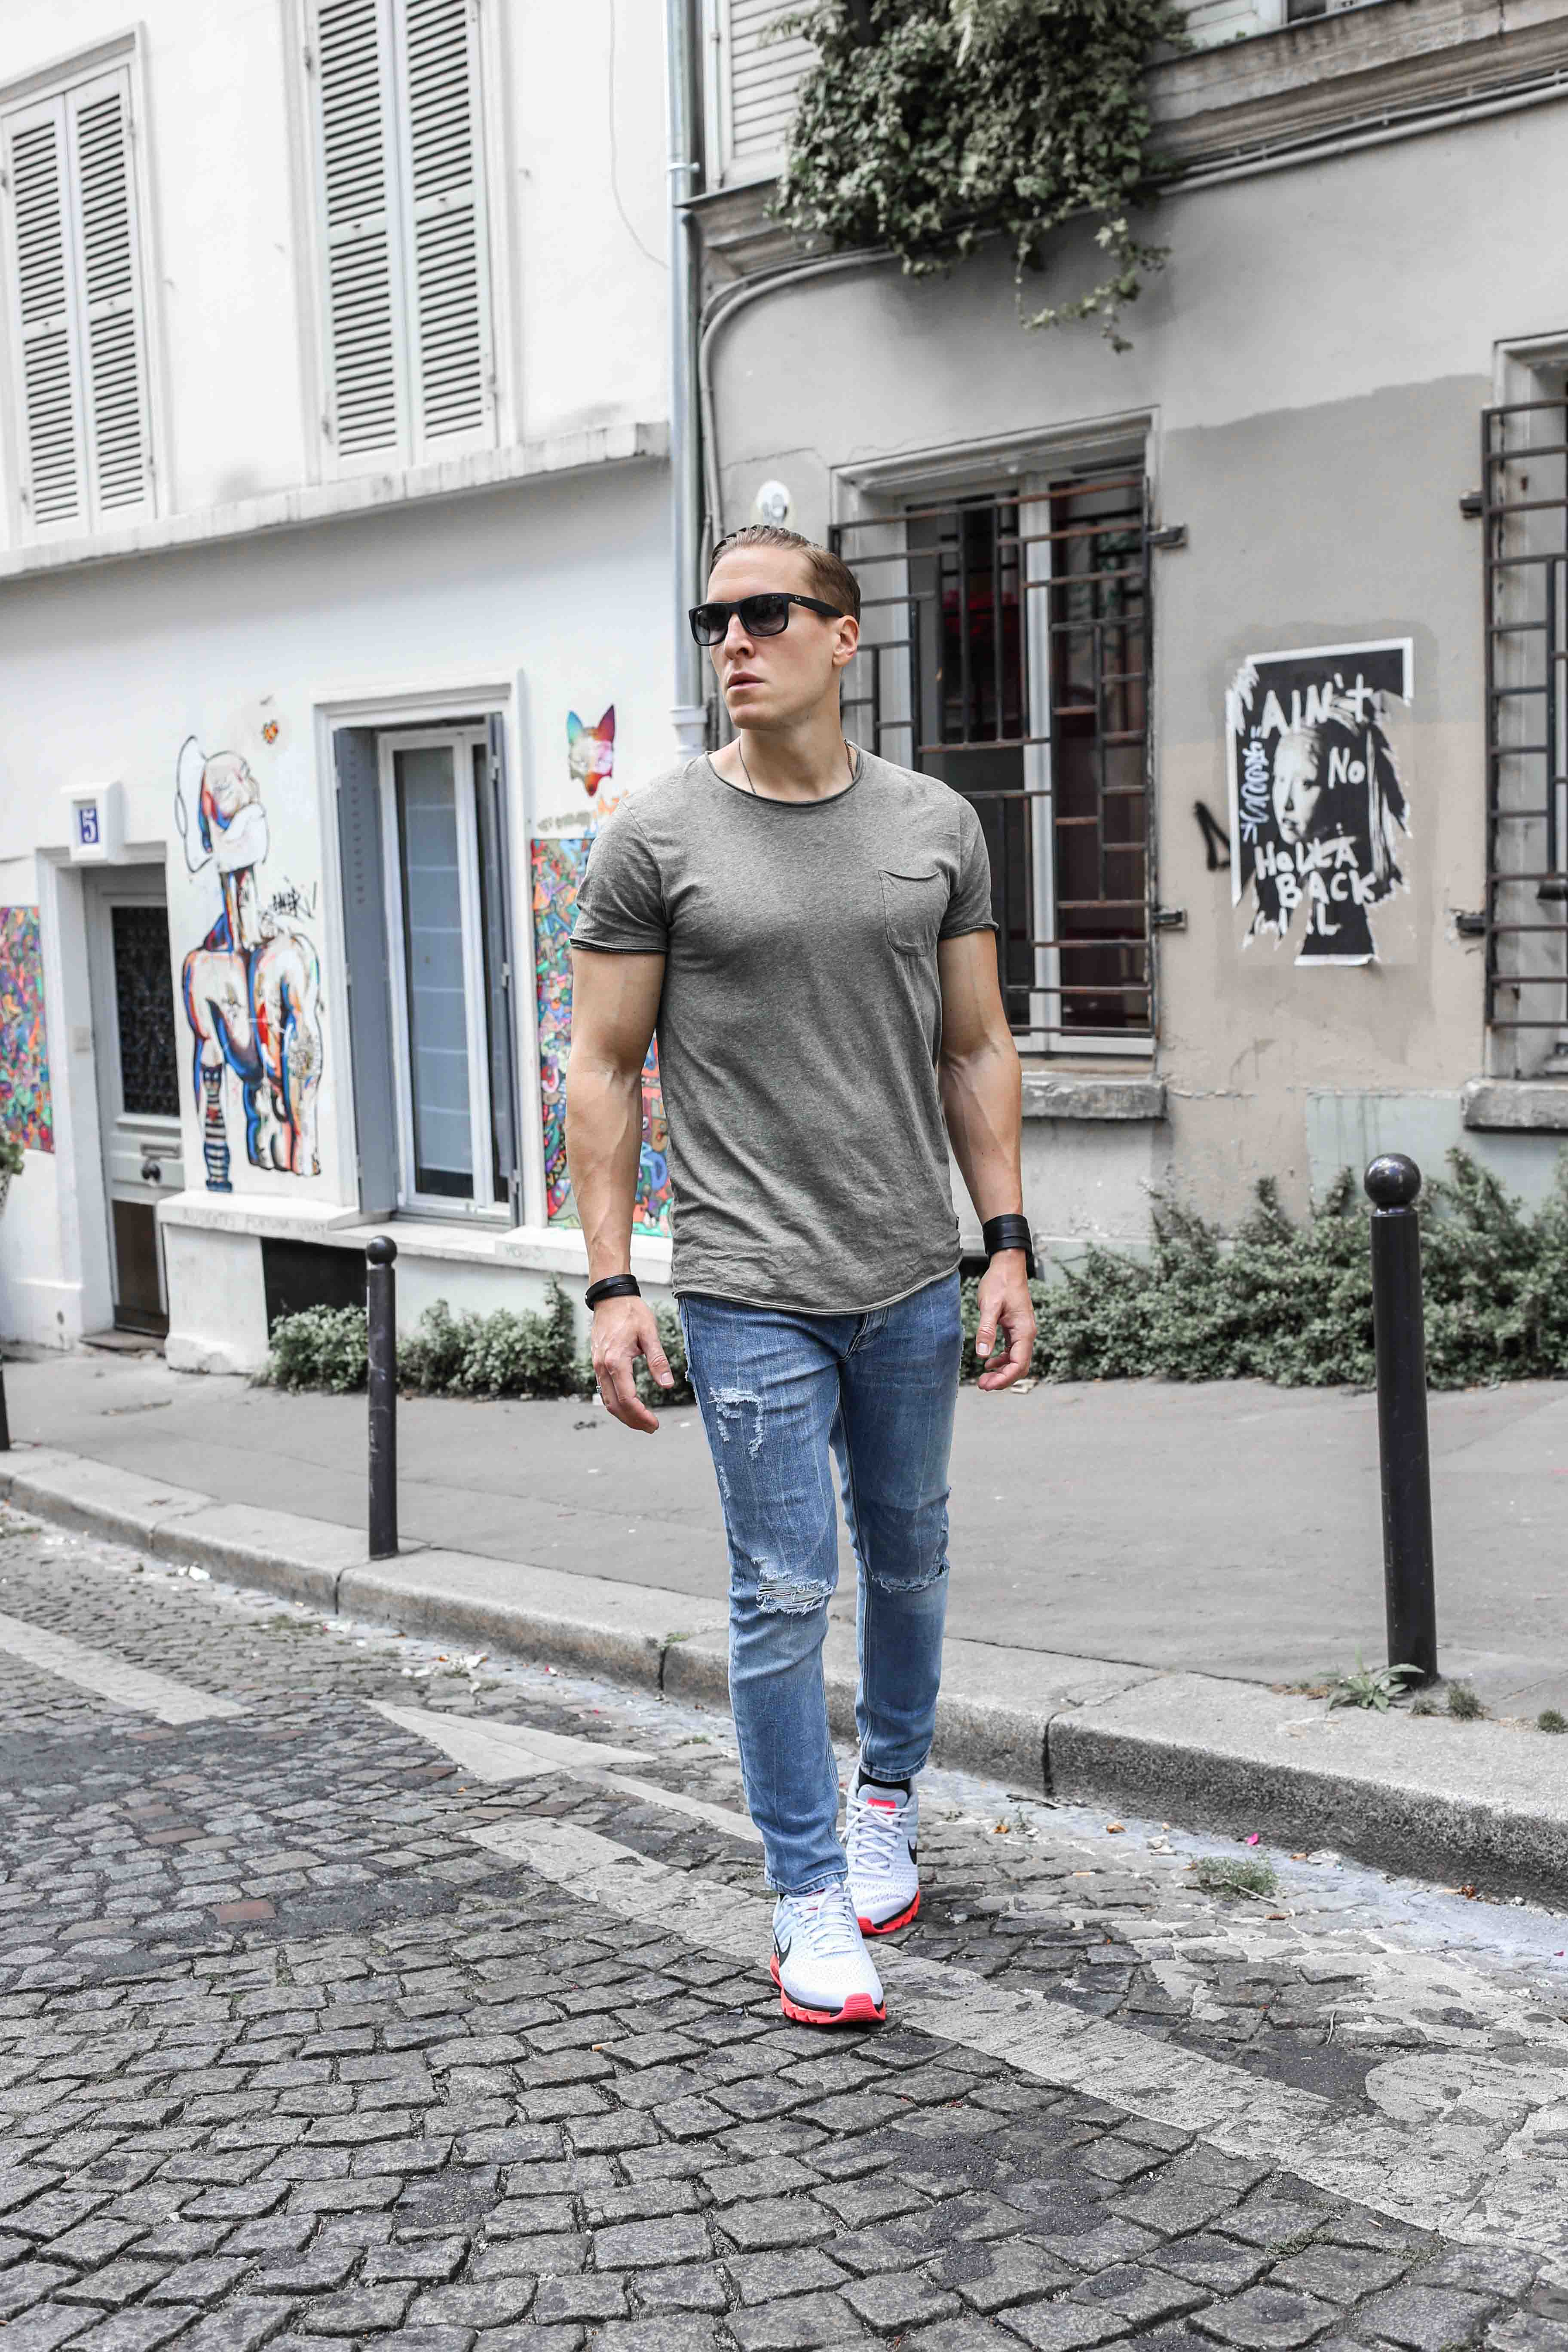 männerblog-modeblog-outfit-paris-basic-look-grünes-tshirt-ripped-jeans-nike-air-max-2017_2328